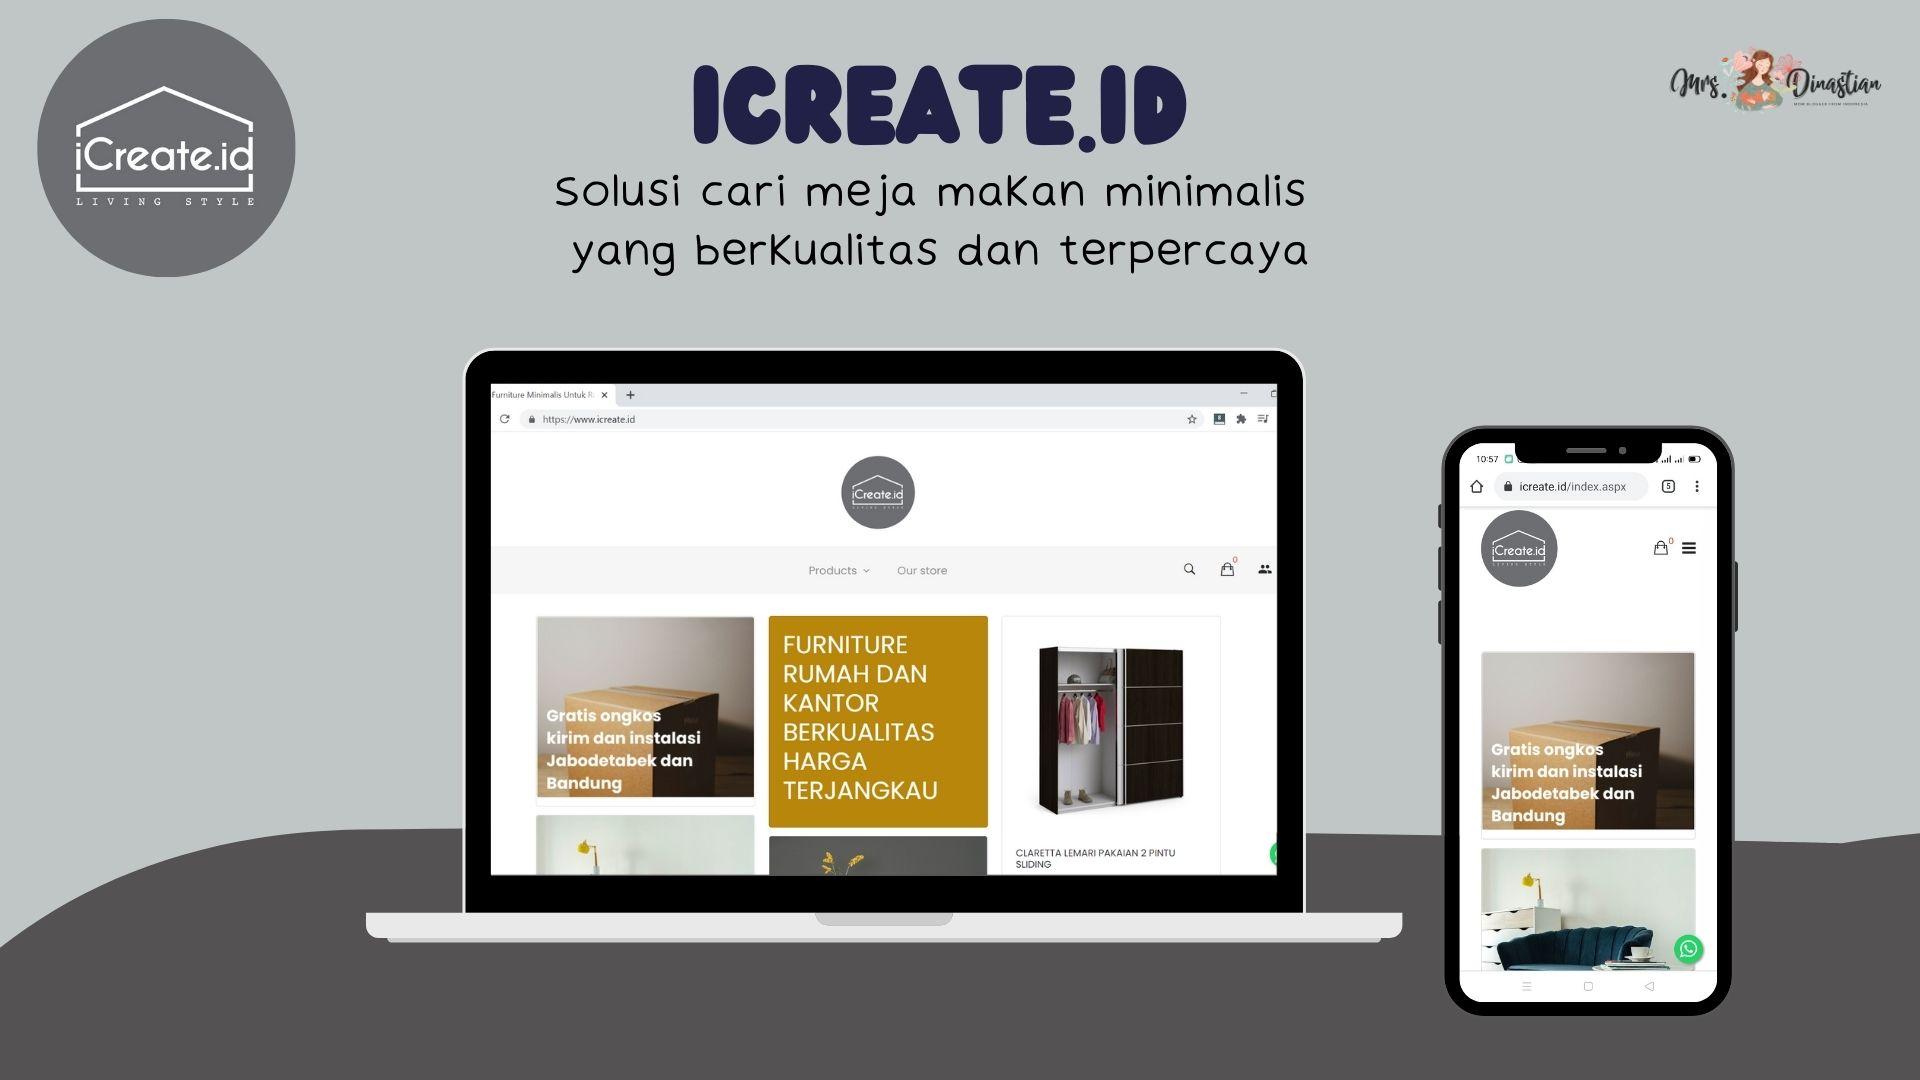 iCreate.id, toko furniture online berkualitas